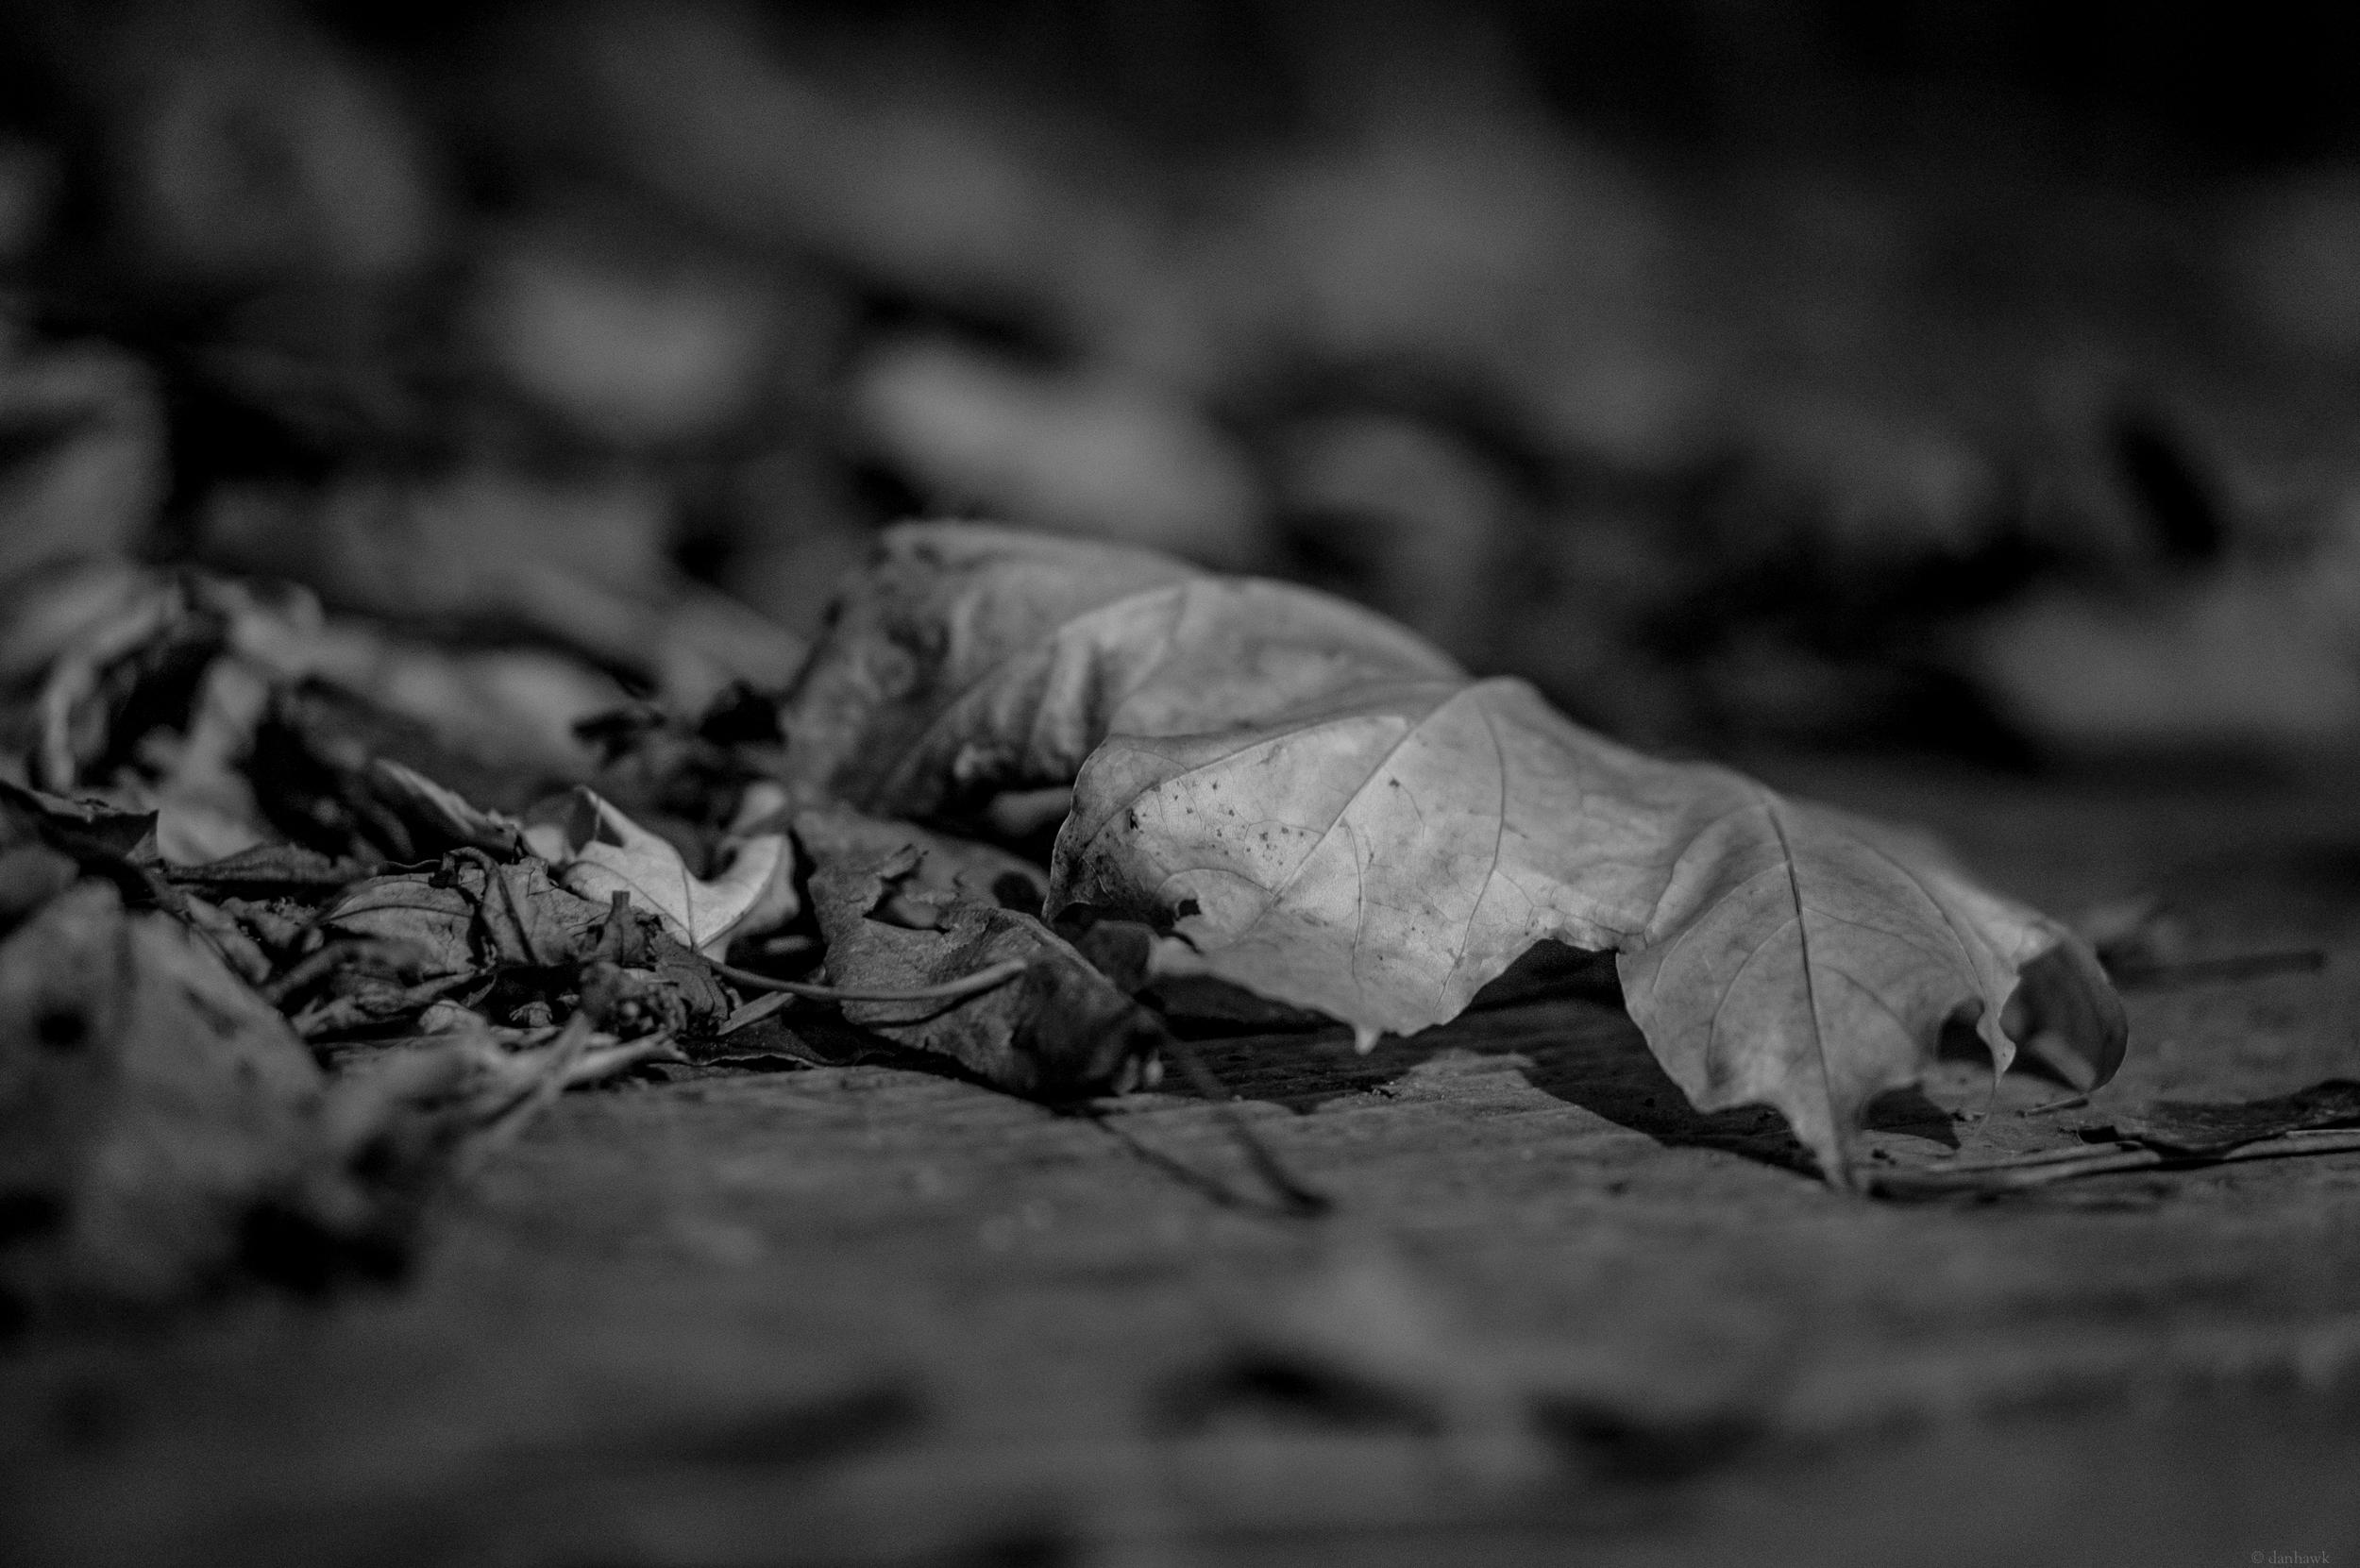 Crumpled | 365 Project | Nov 27th, 2012